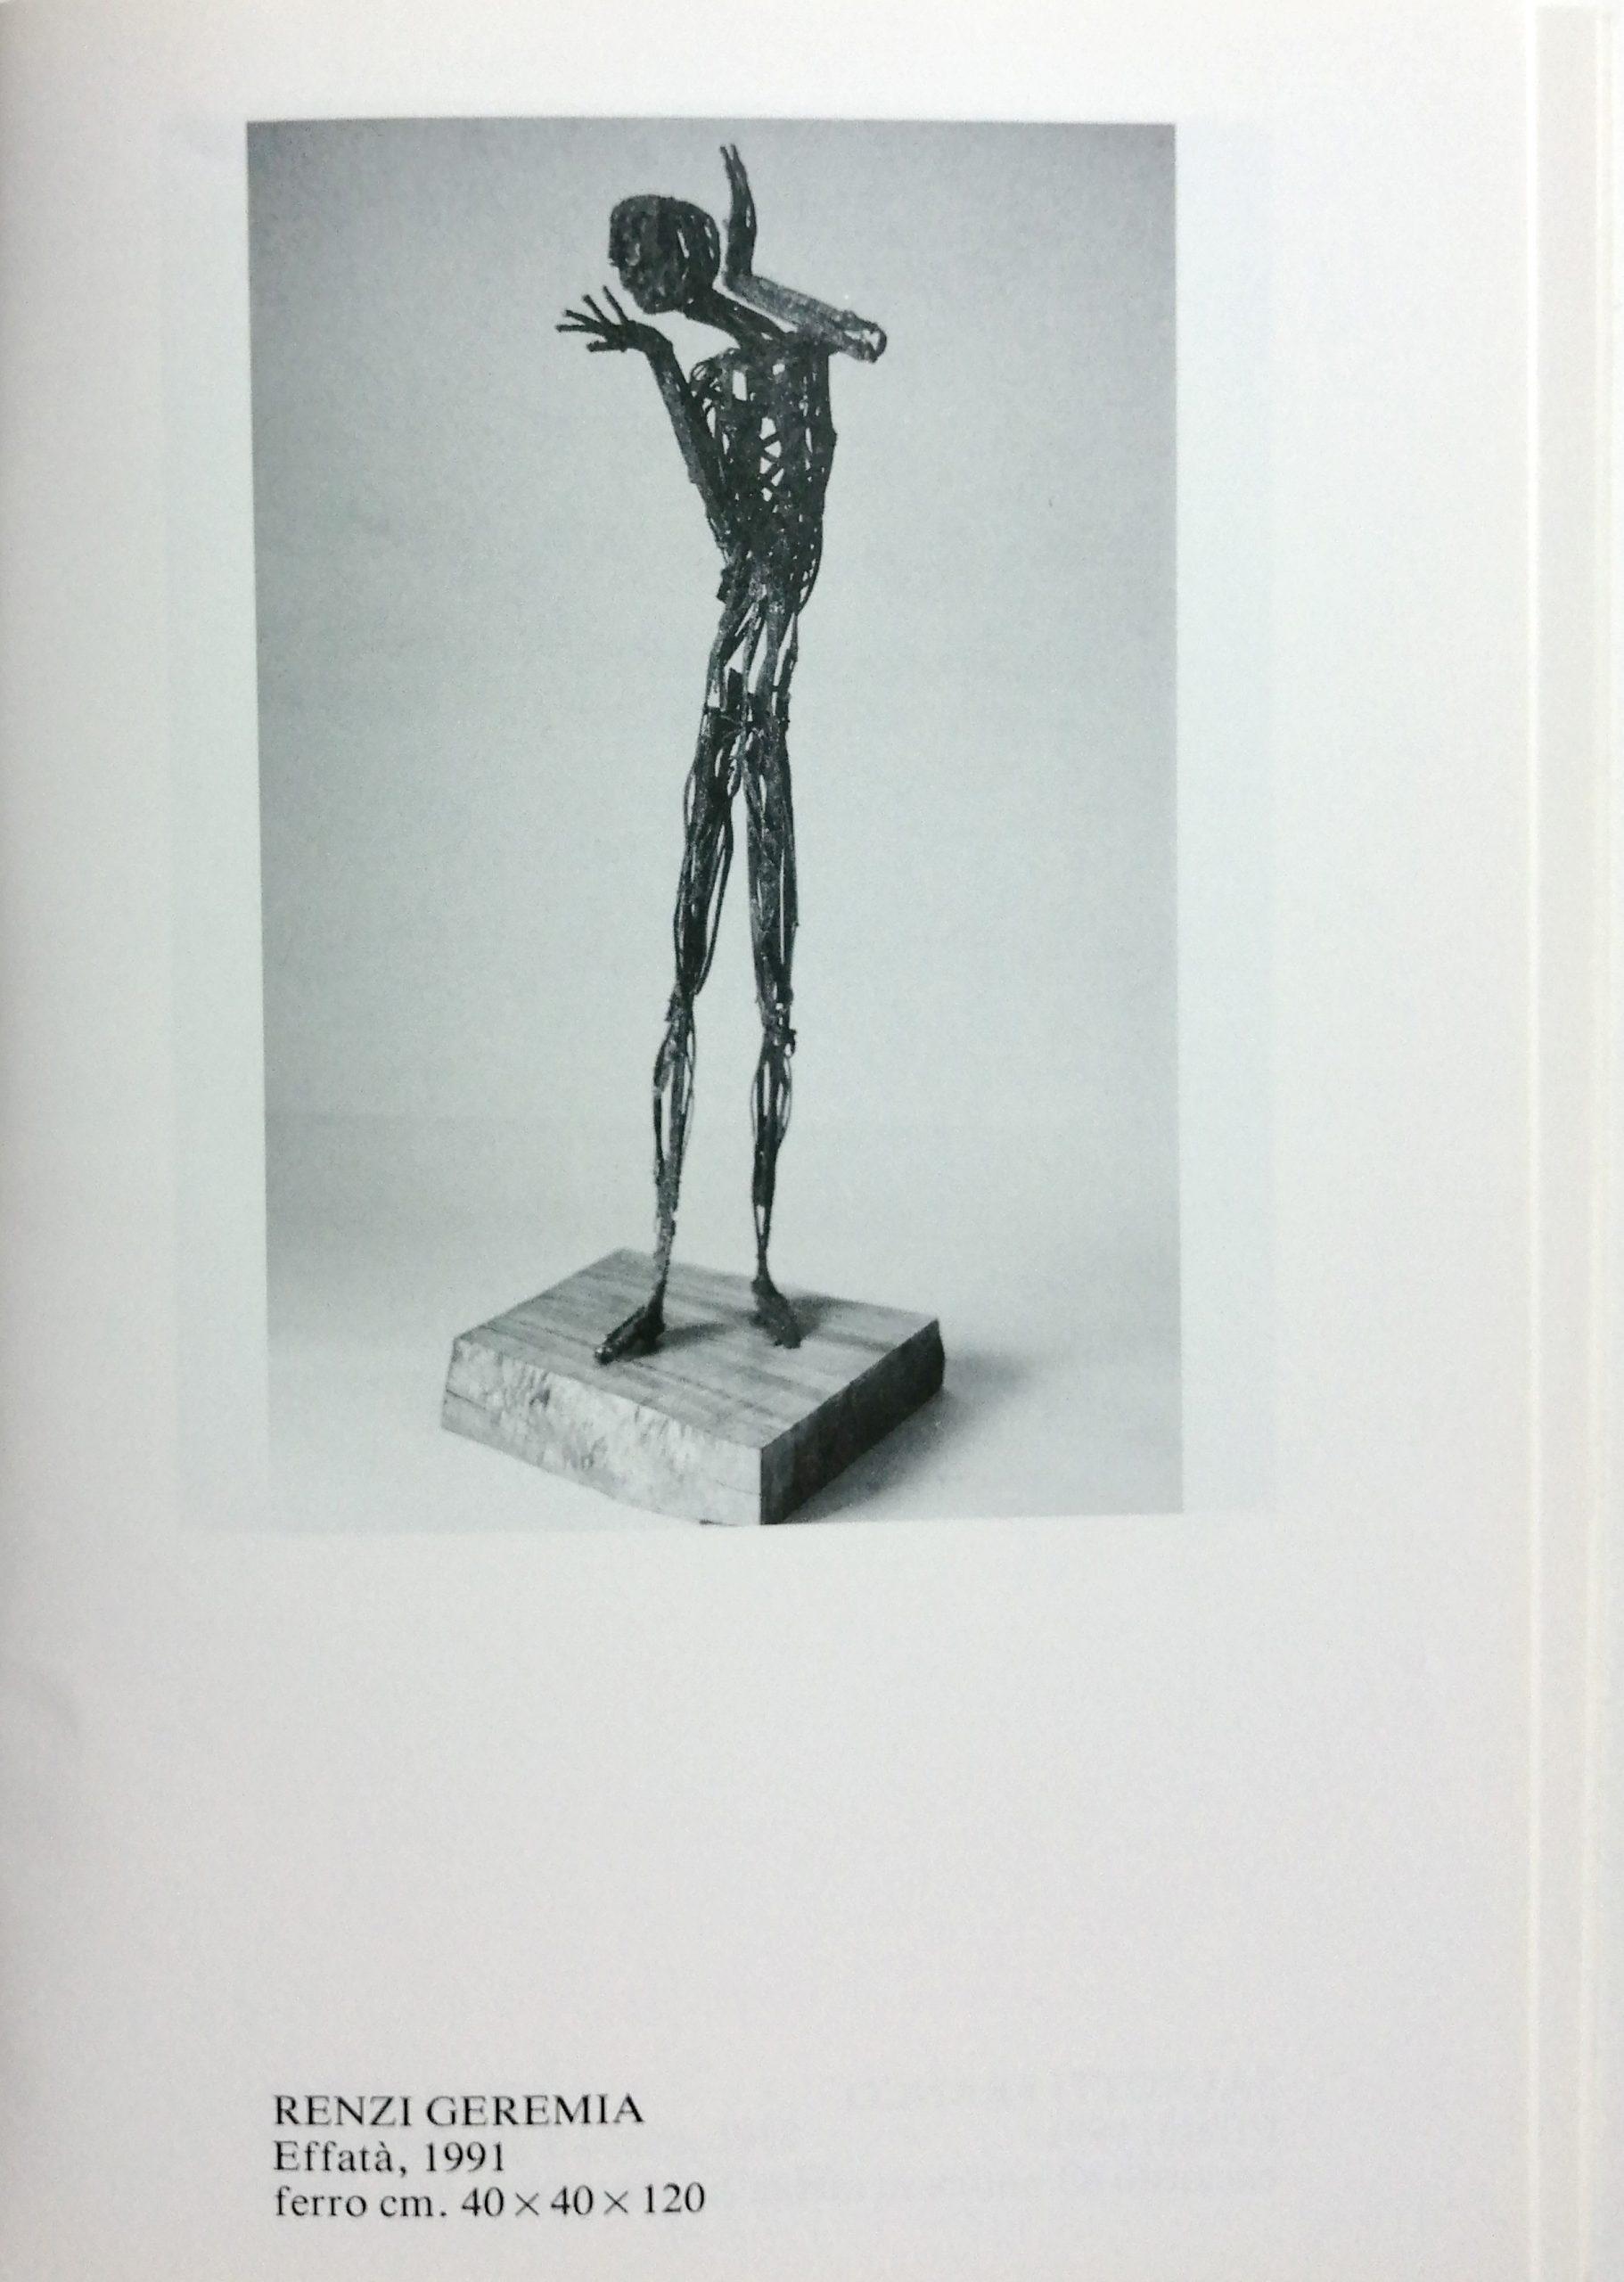 1991 Arte Sacra in San Simpliciano Milano pagina scaled - Bibliography/ Catalogues